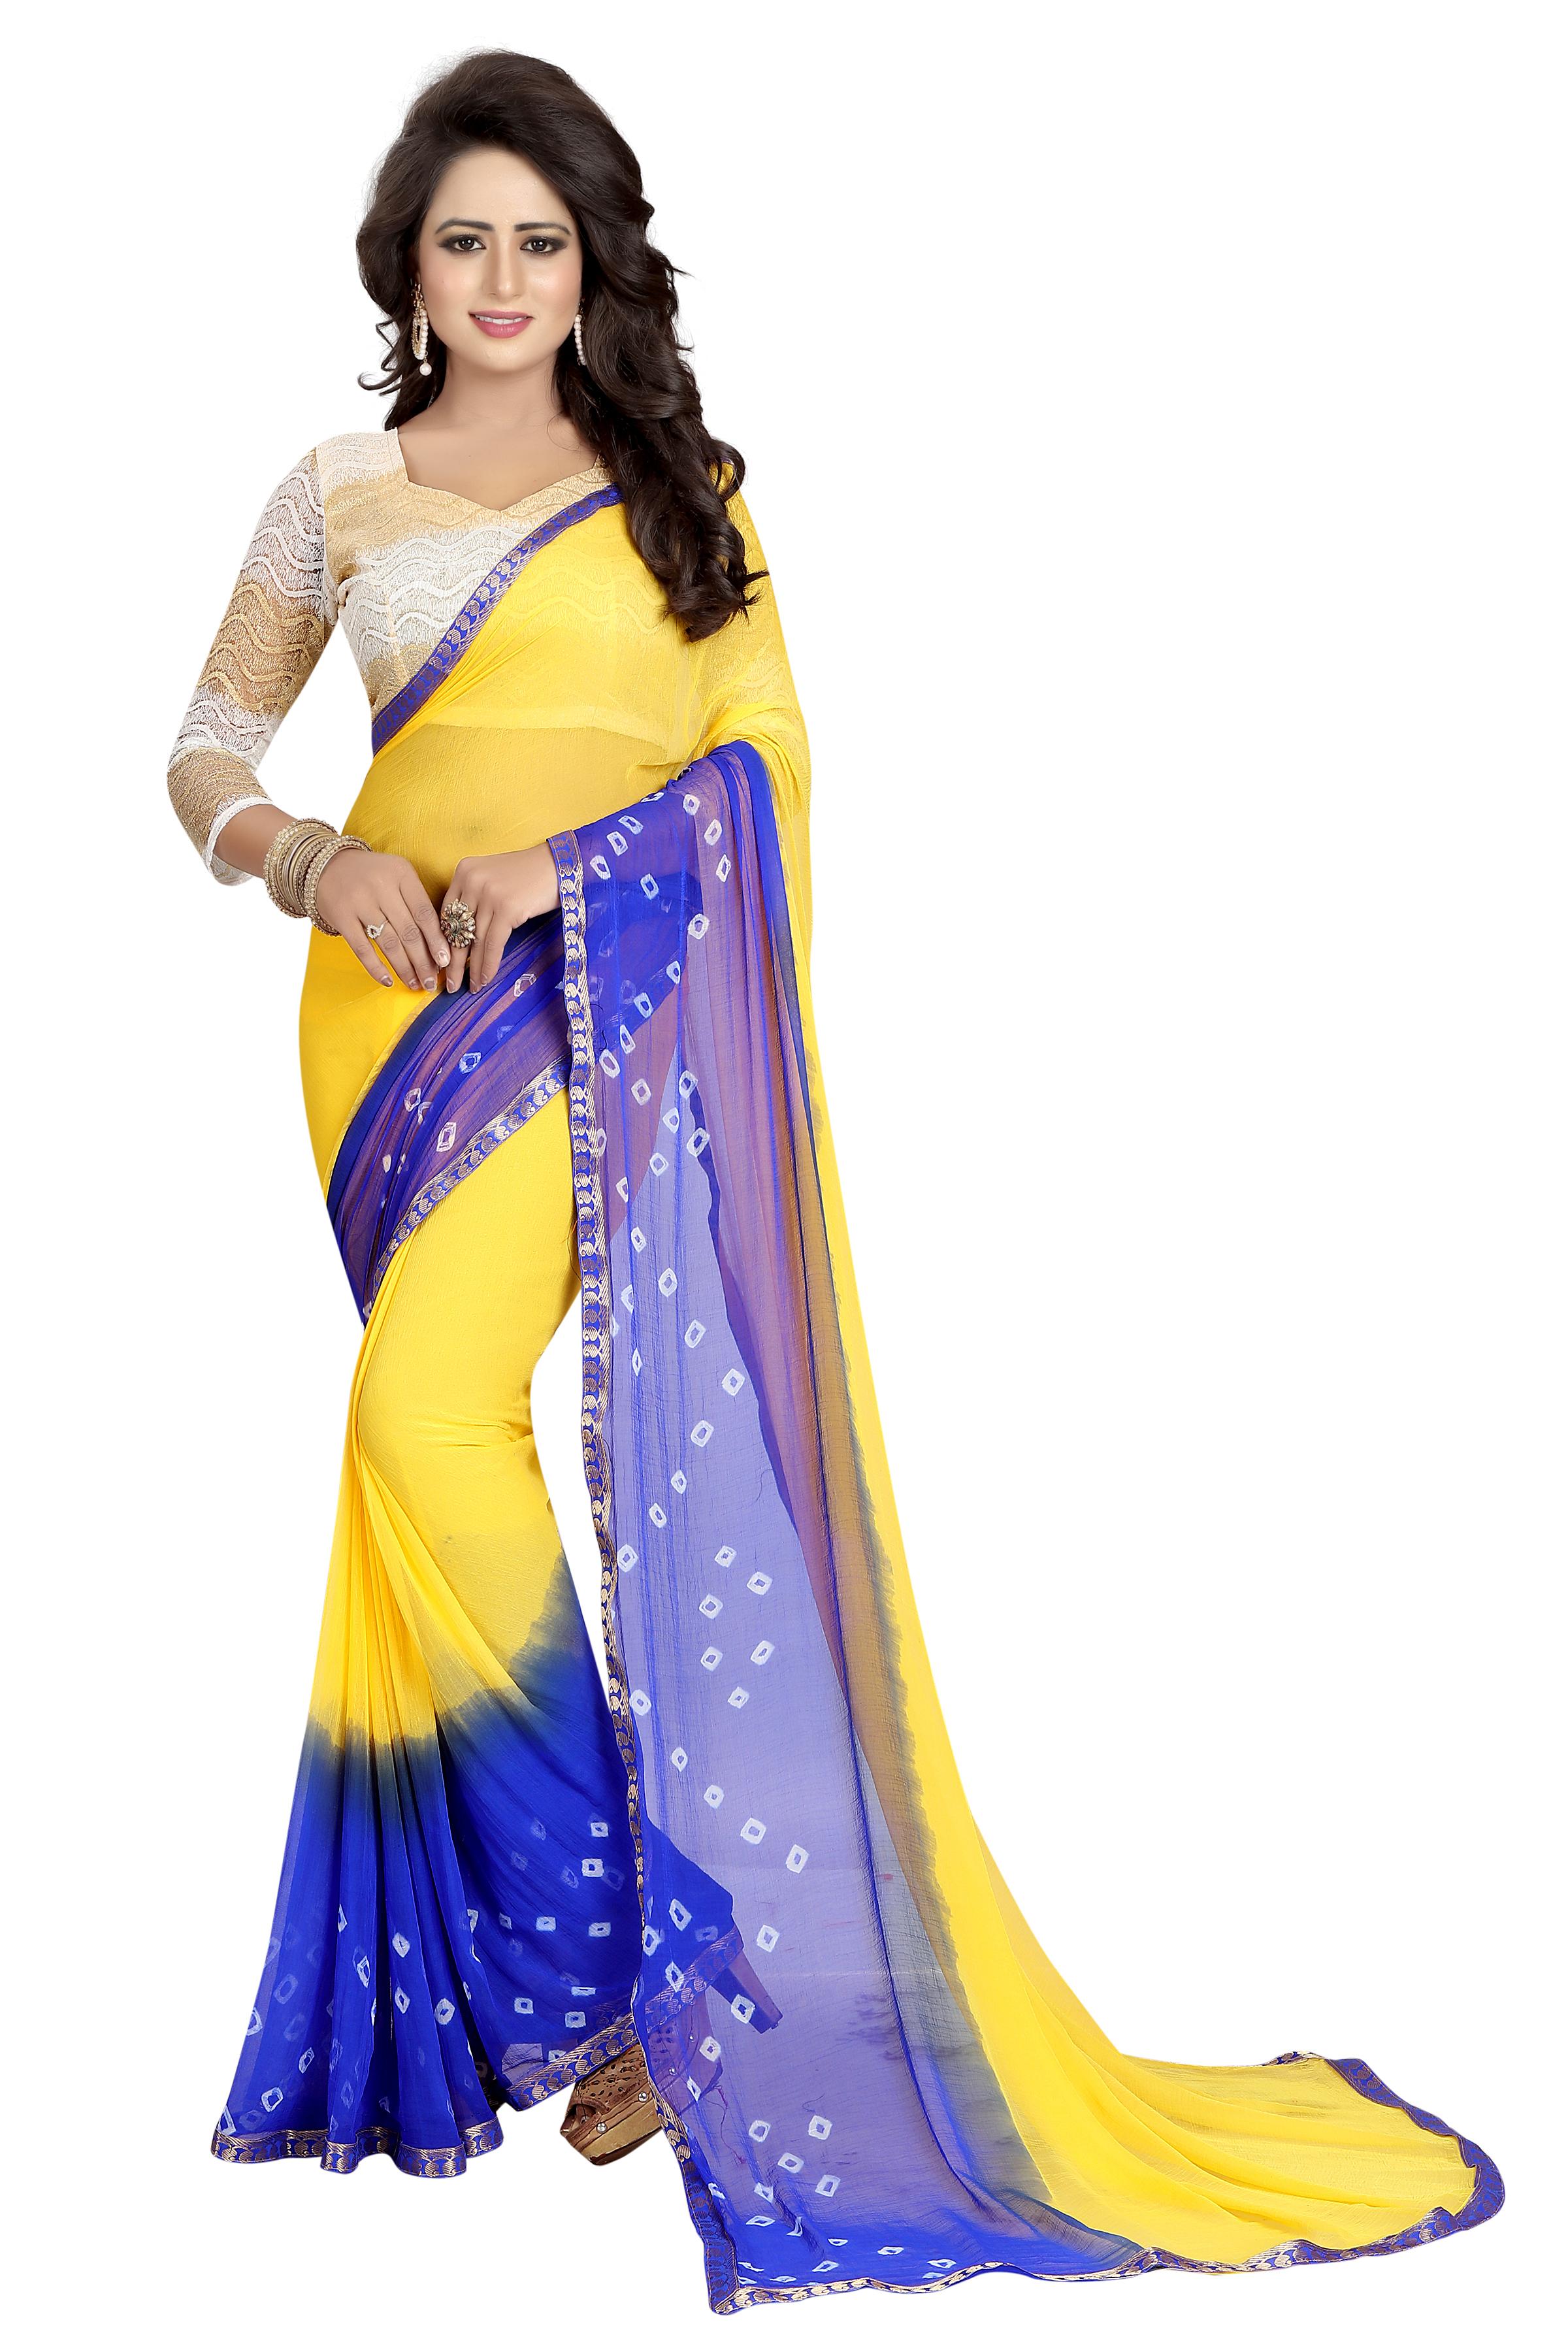 chiffon bandhani saree